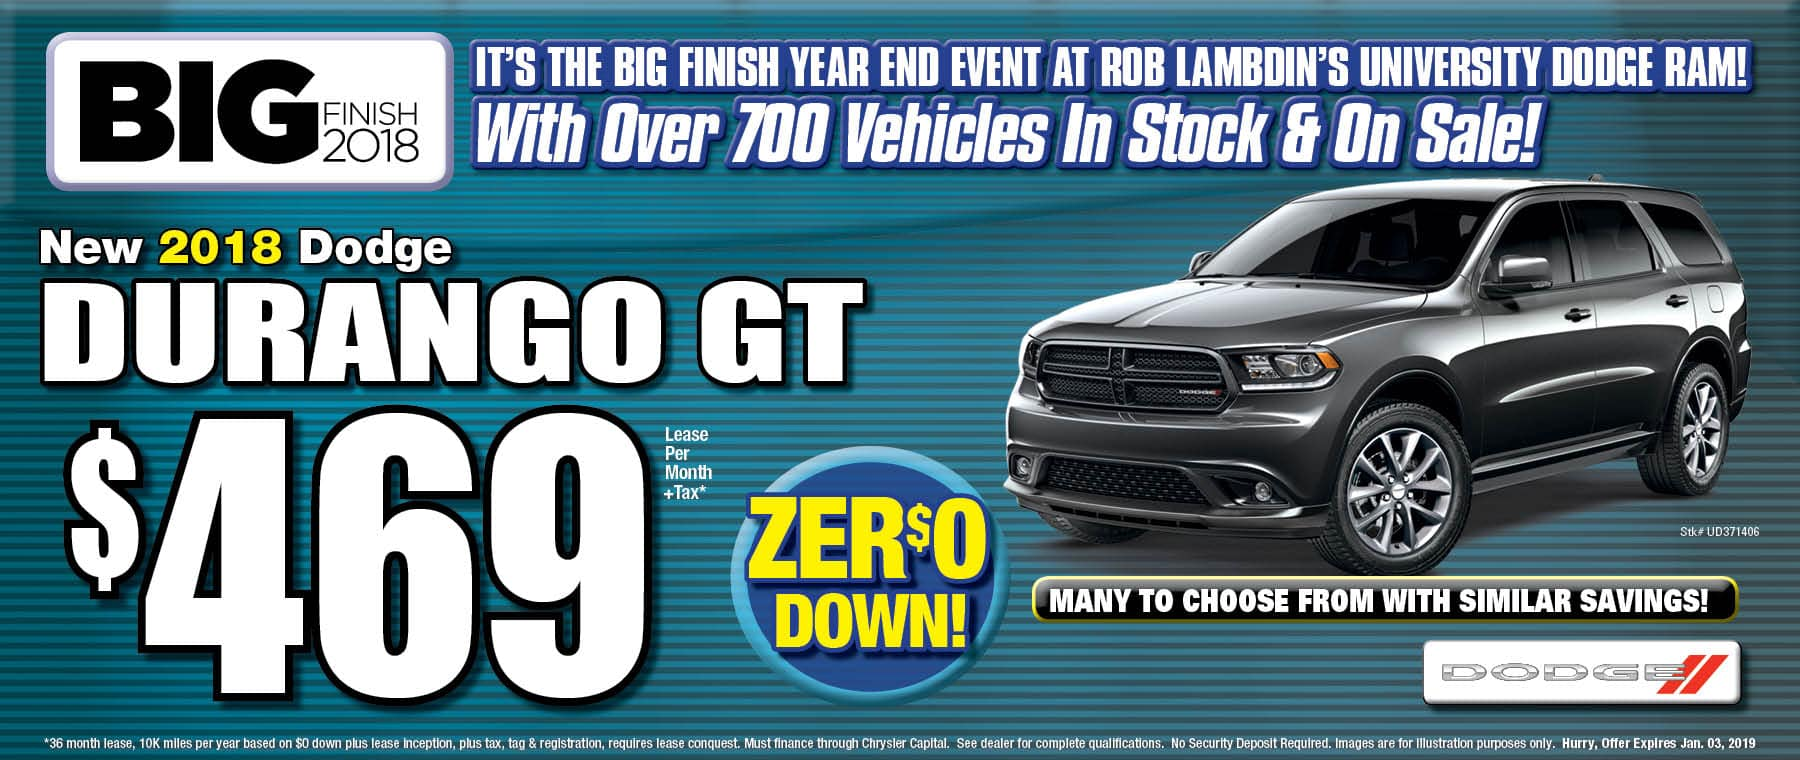 Dodge Durango GT!